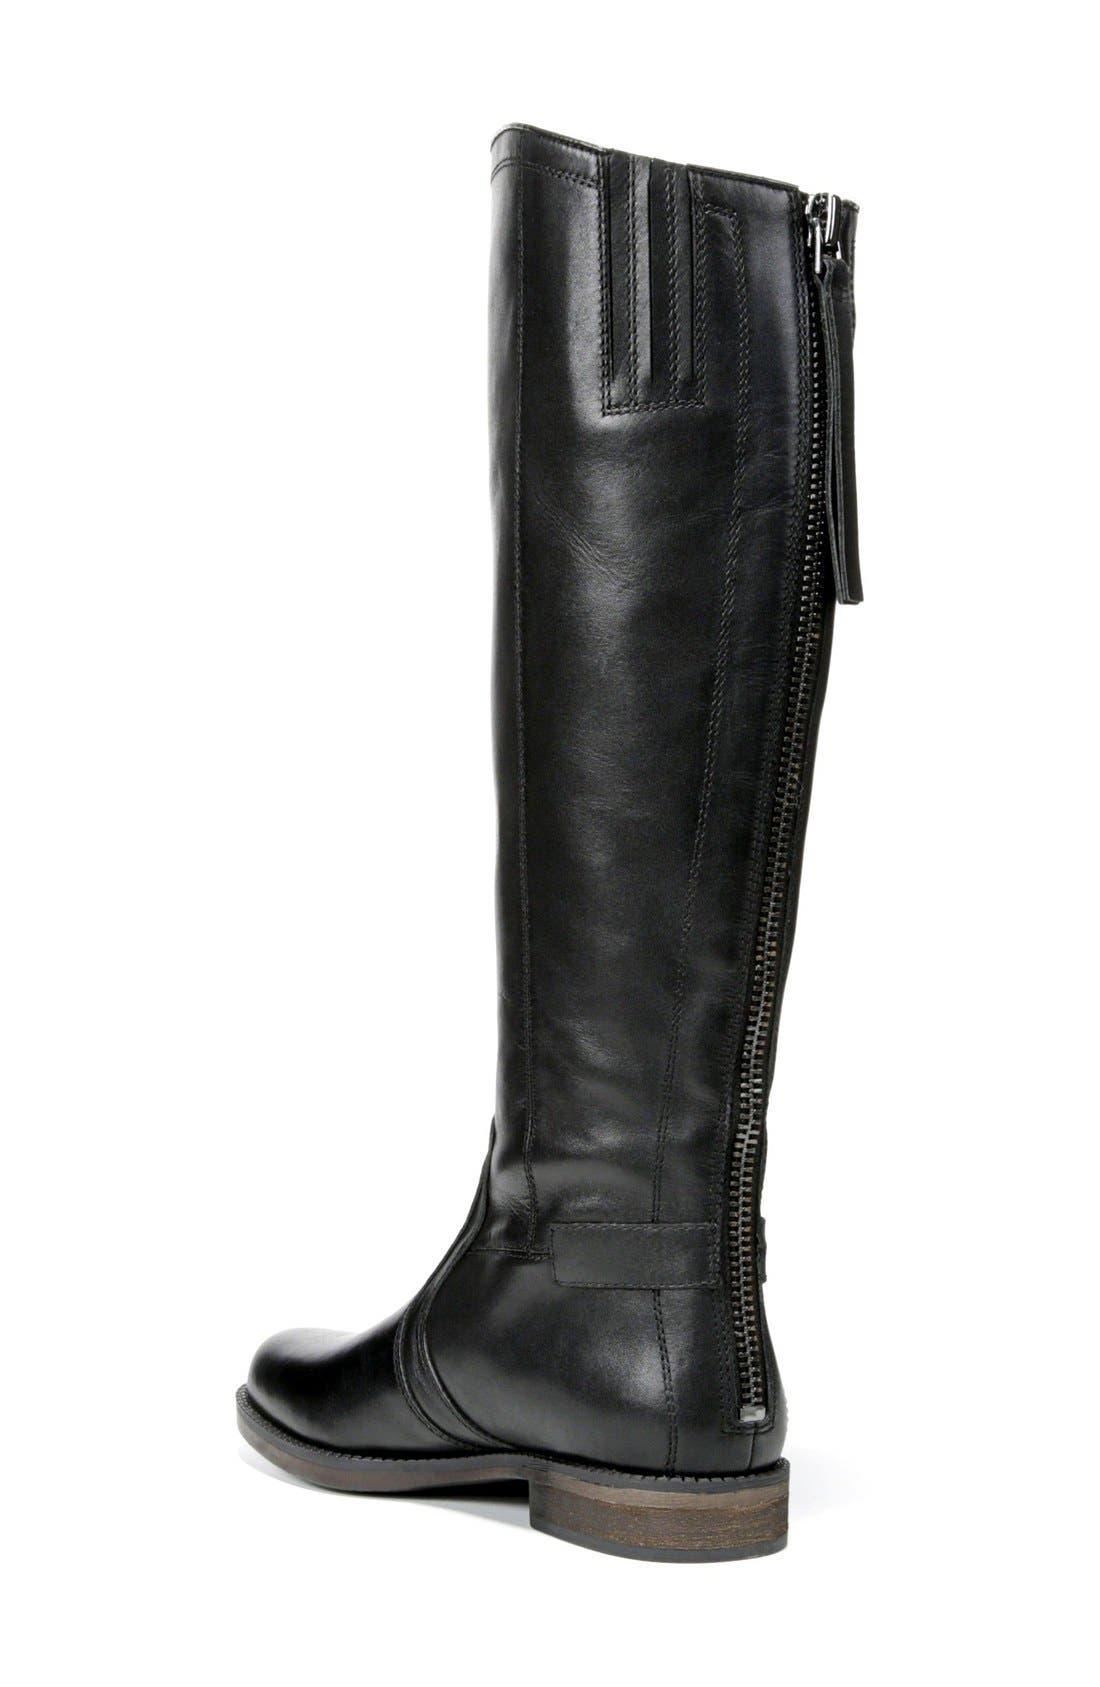 Alternate Image 2  - SARTO by Franco Sarto Carlana Riding Boot (Women) (Wide Calf)